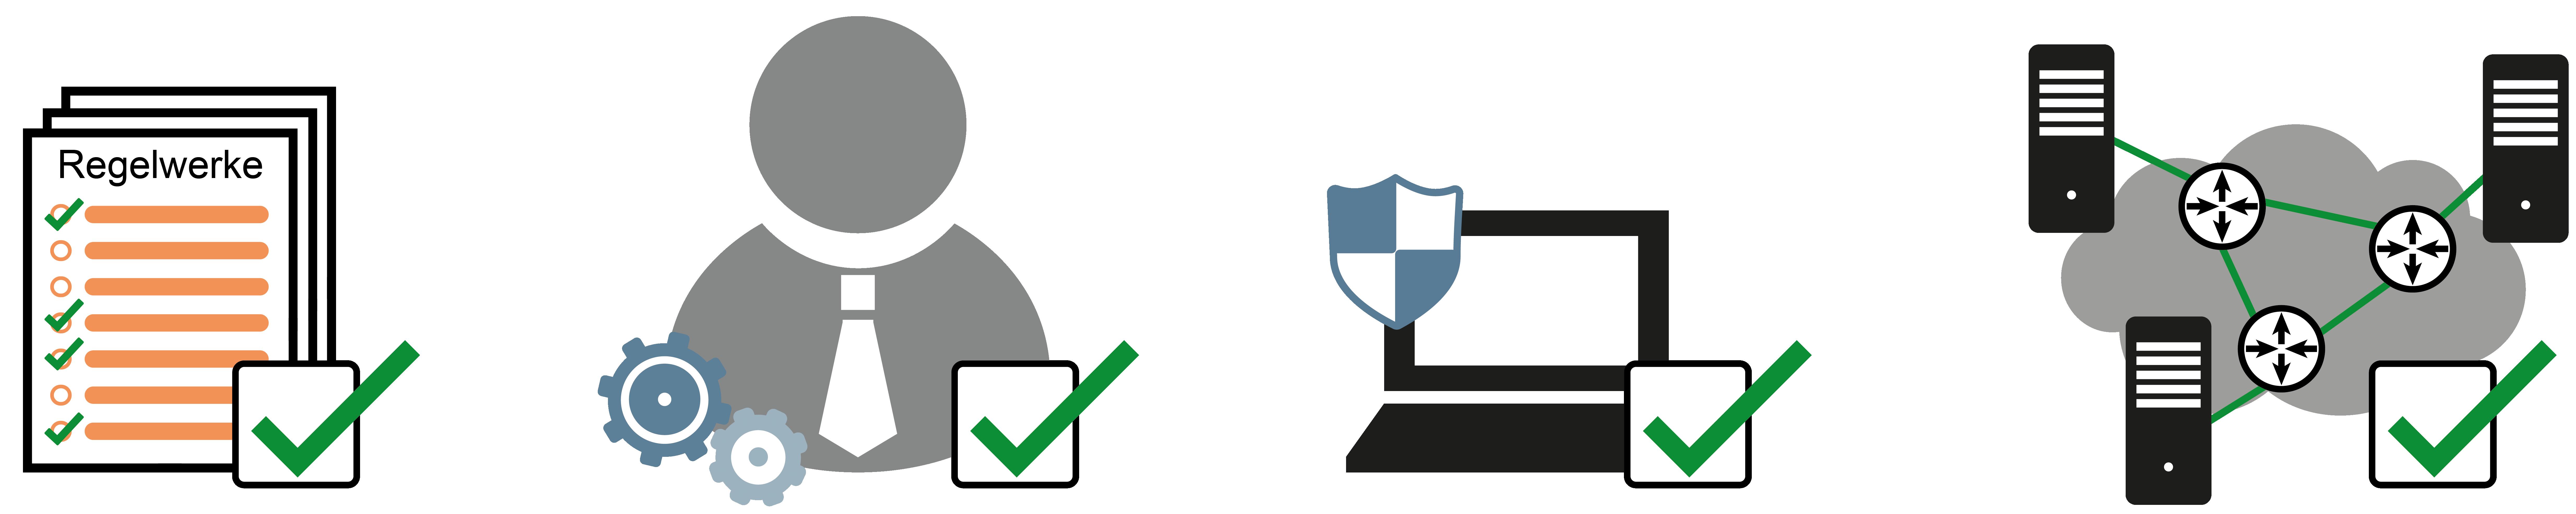 Cyber-Sicherheitsmaßnahme – Glossar Cyber-Sicherheit – Prof. Norbert Pohlmann